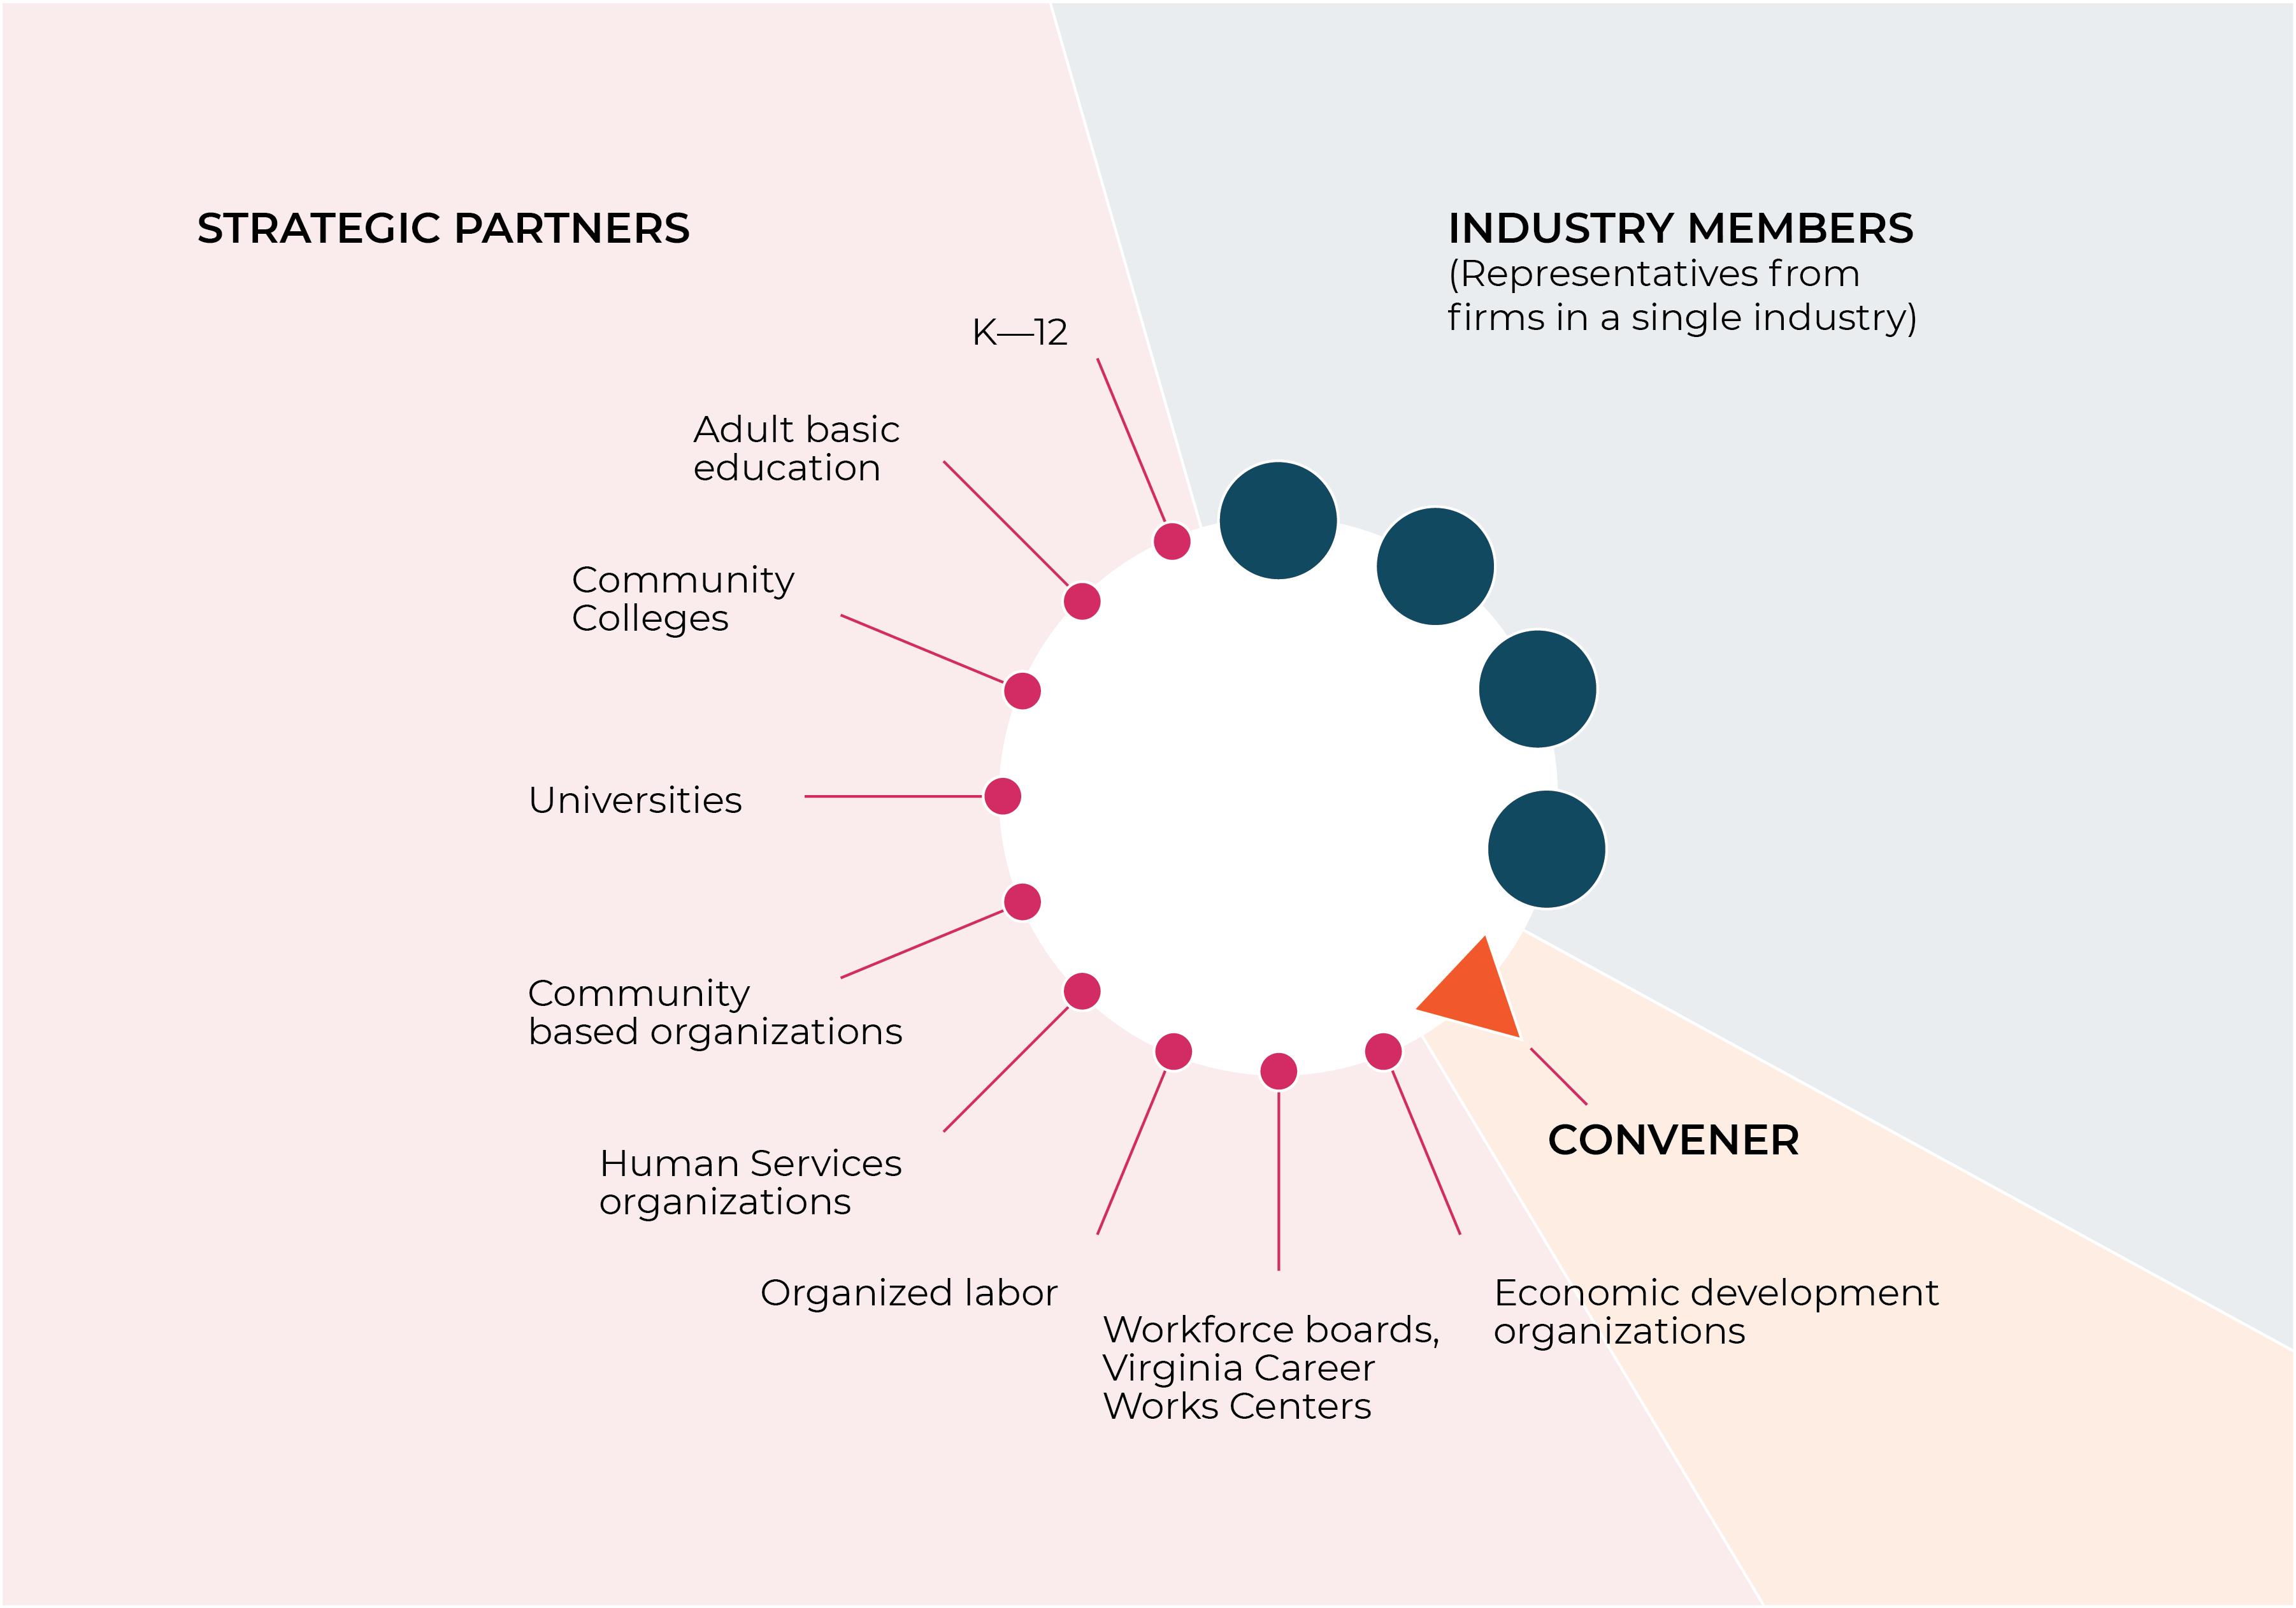 Strategic Partners 55%, Industry Members 35% and Conveners 10%, circle pie chart